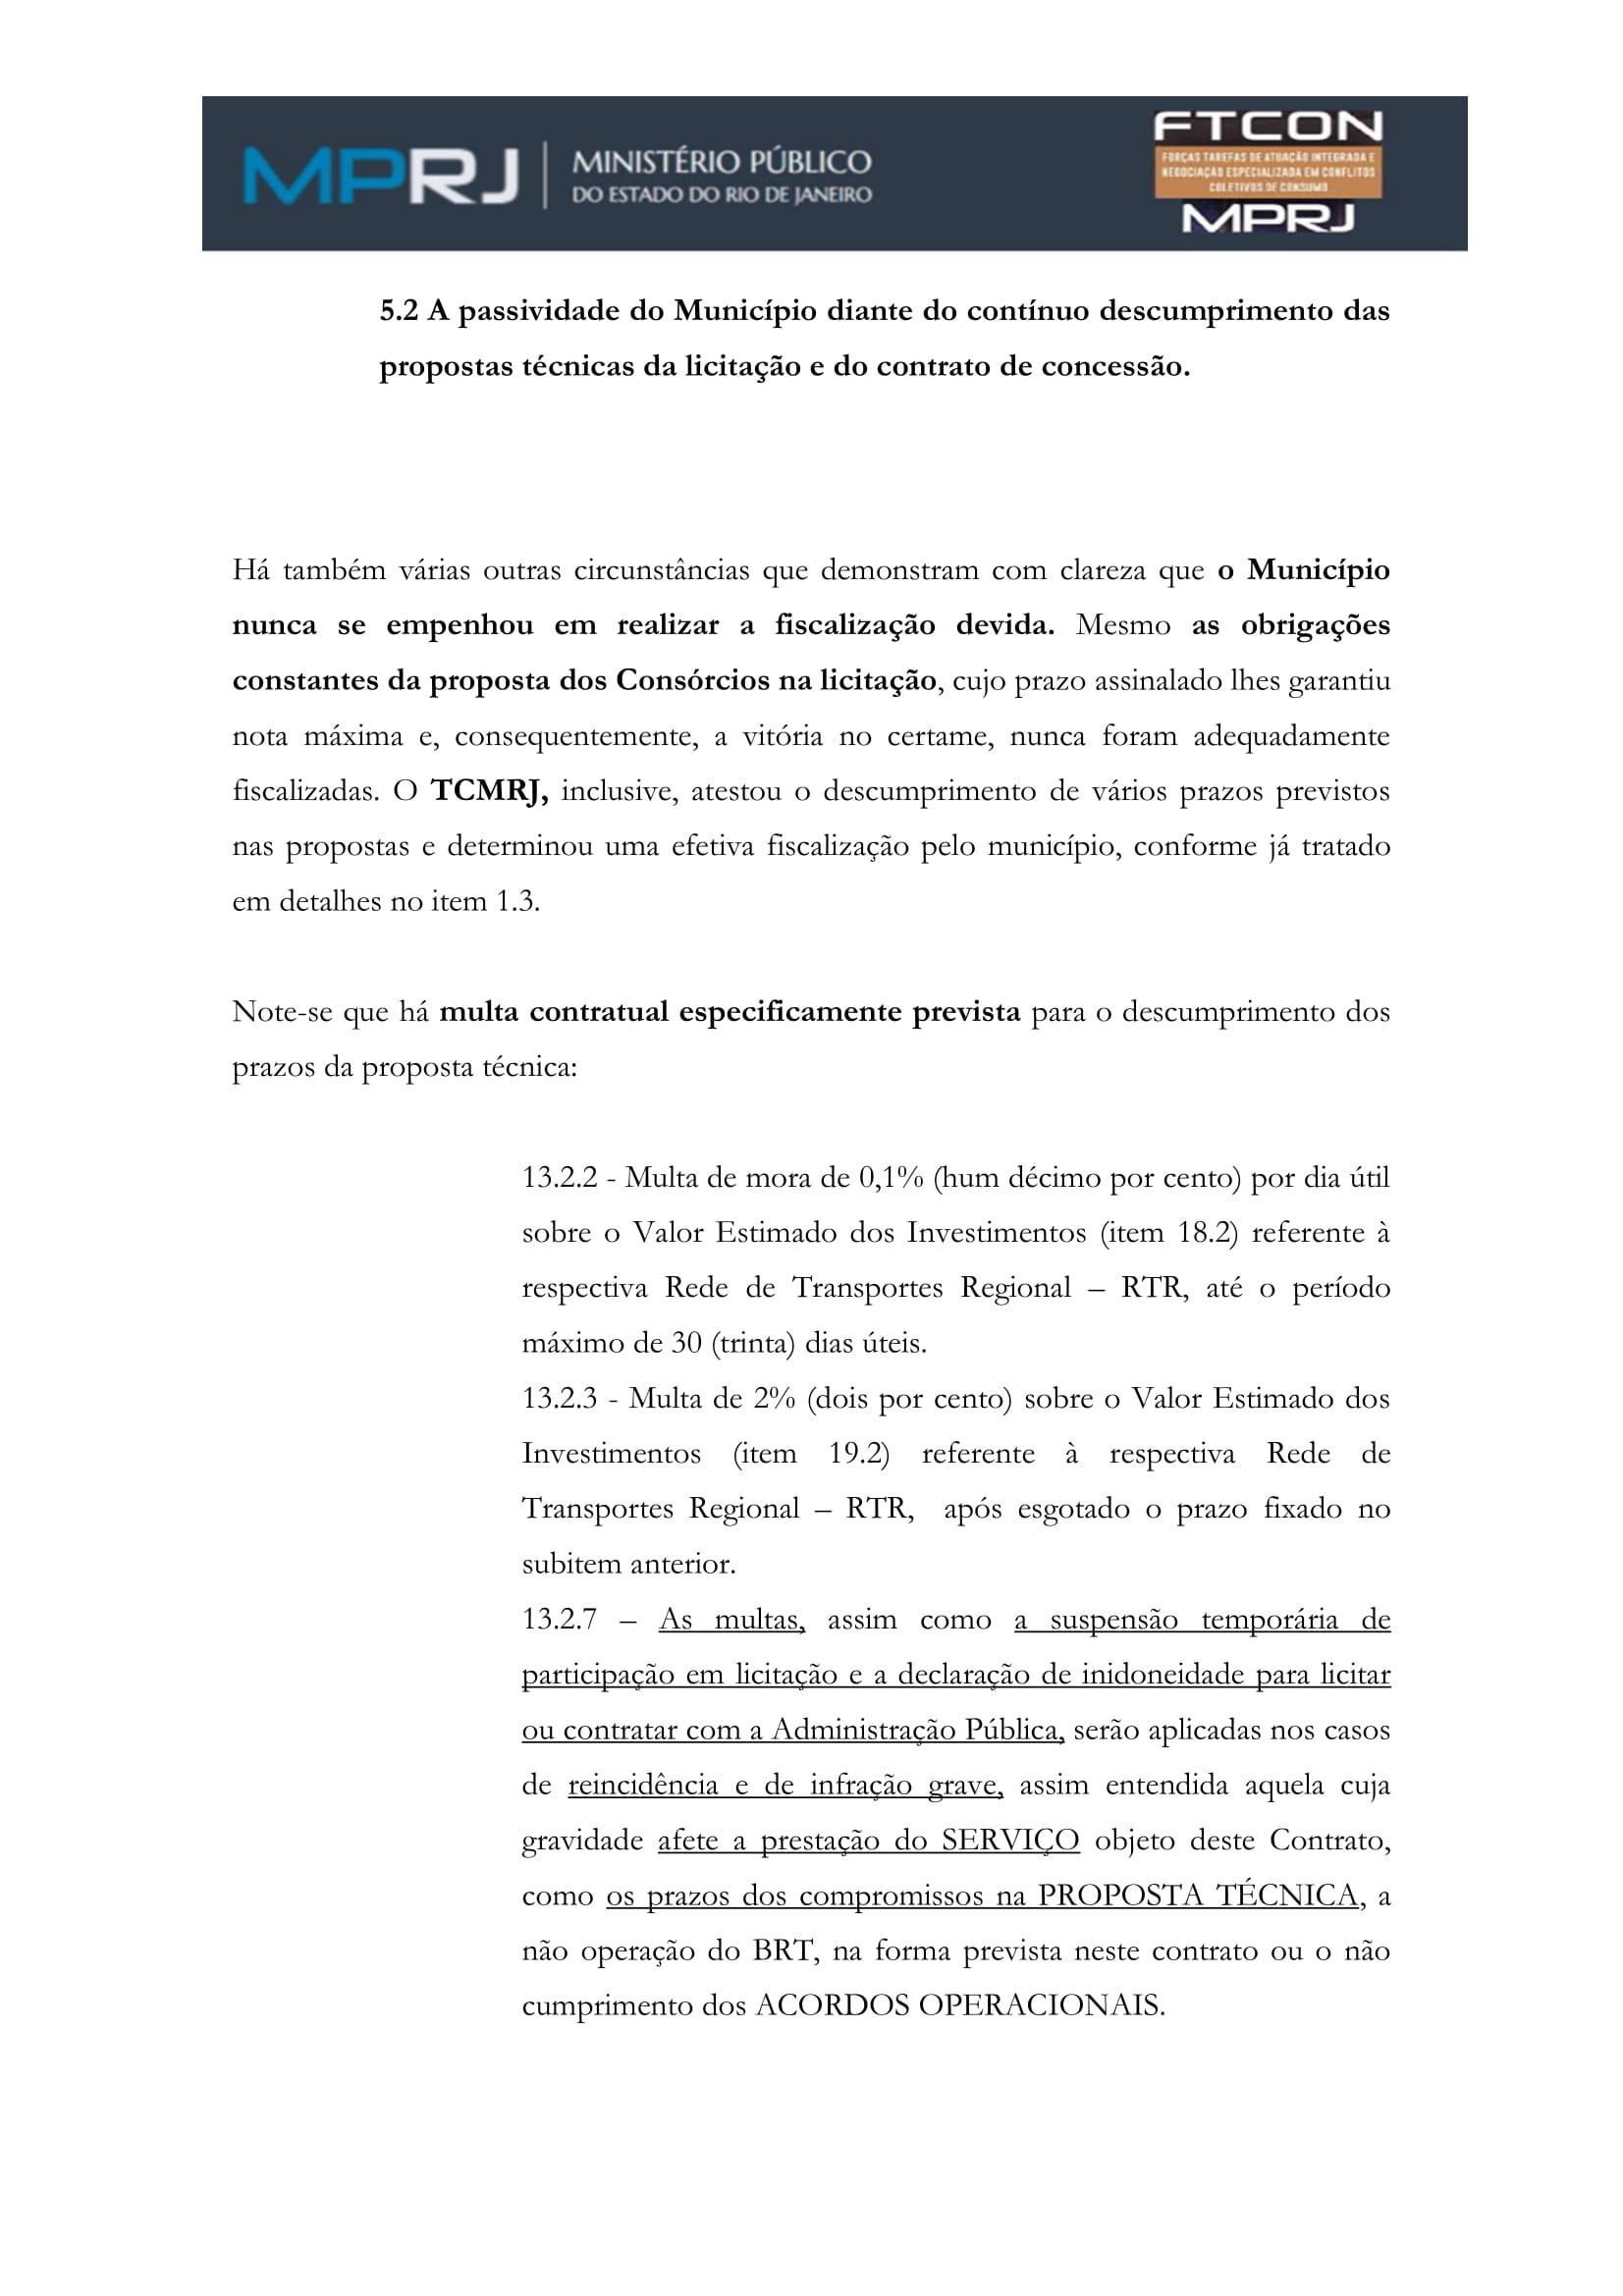 acp_caducidade_onibus_dr_rt-106